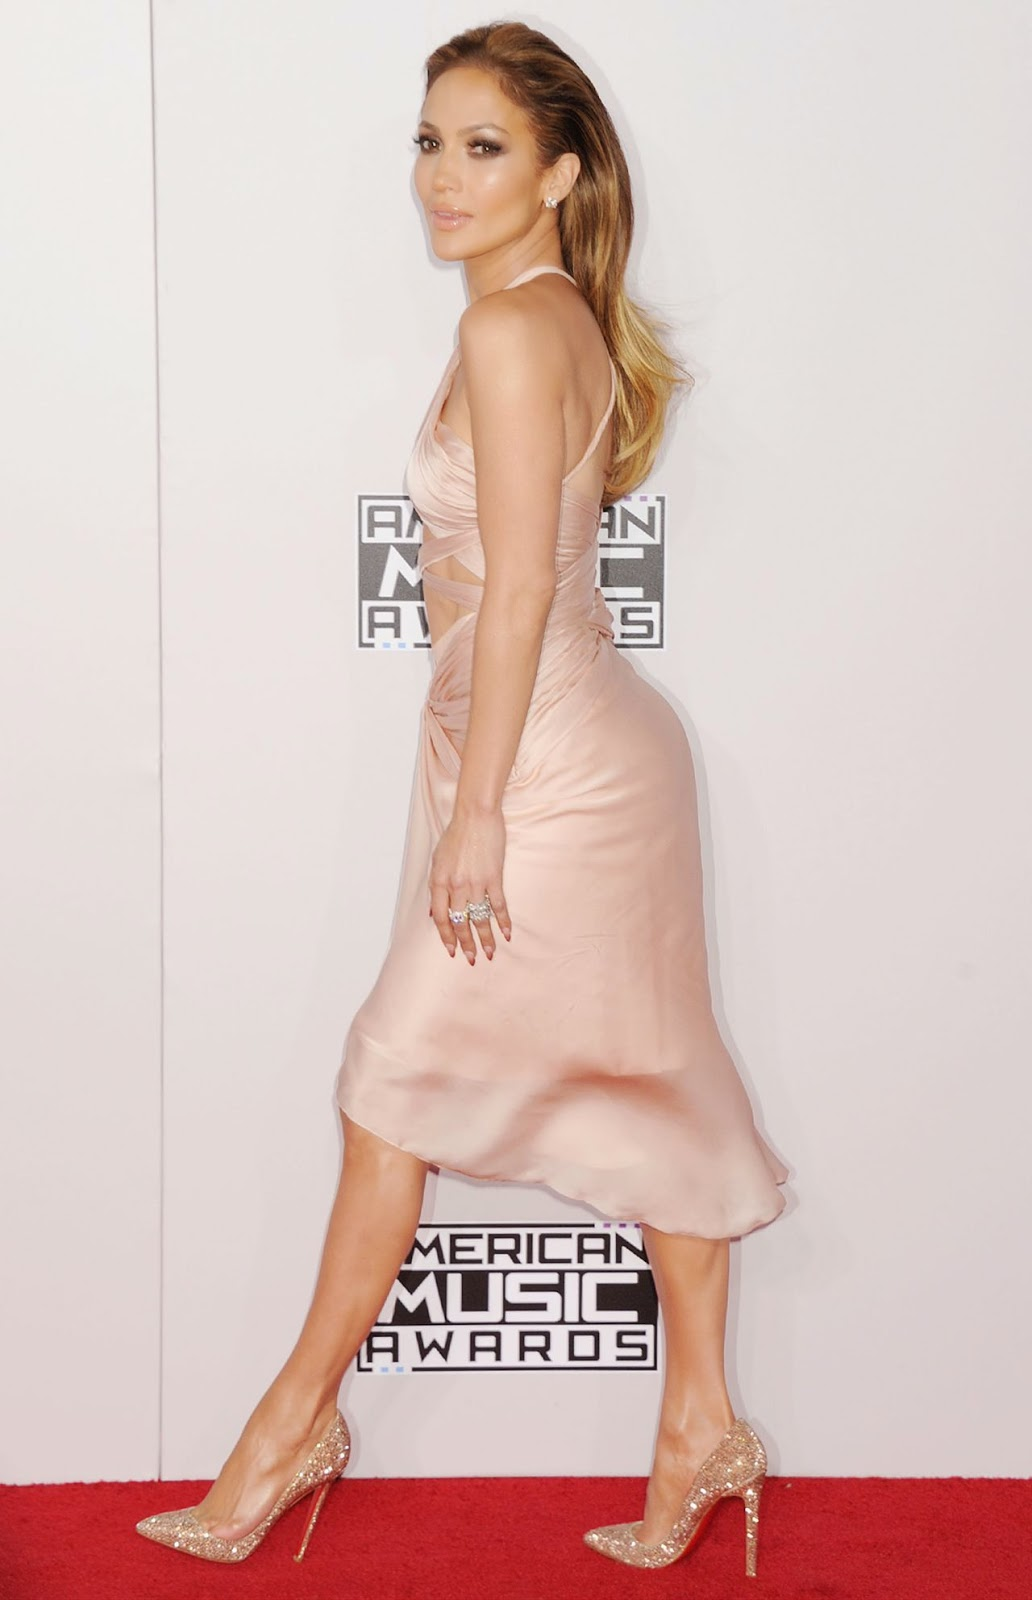 Jennifer Lopez and Iggy Azealas Booty performance steals